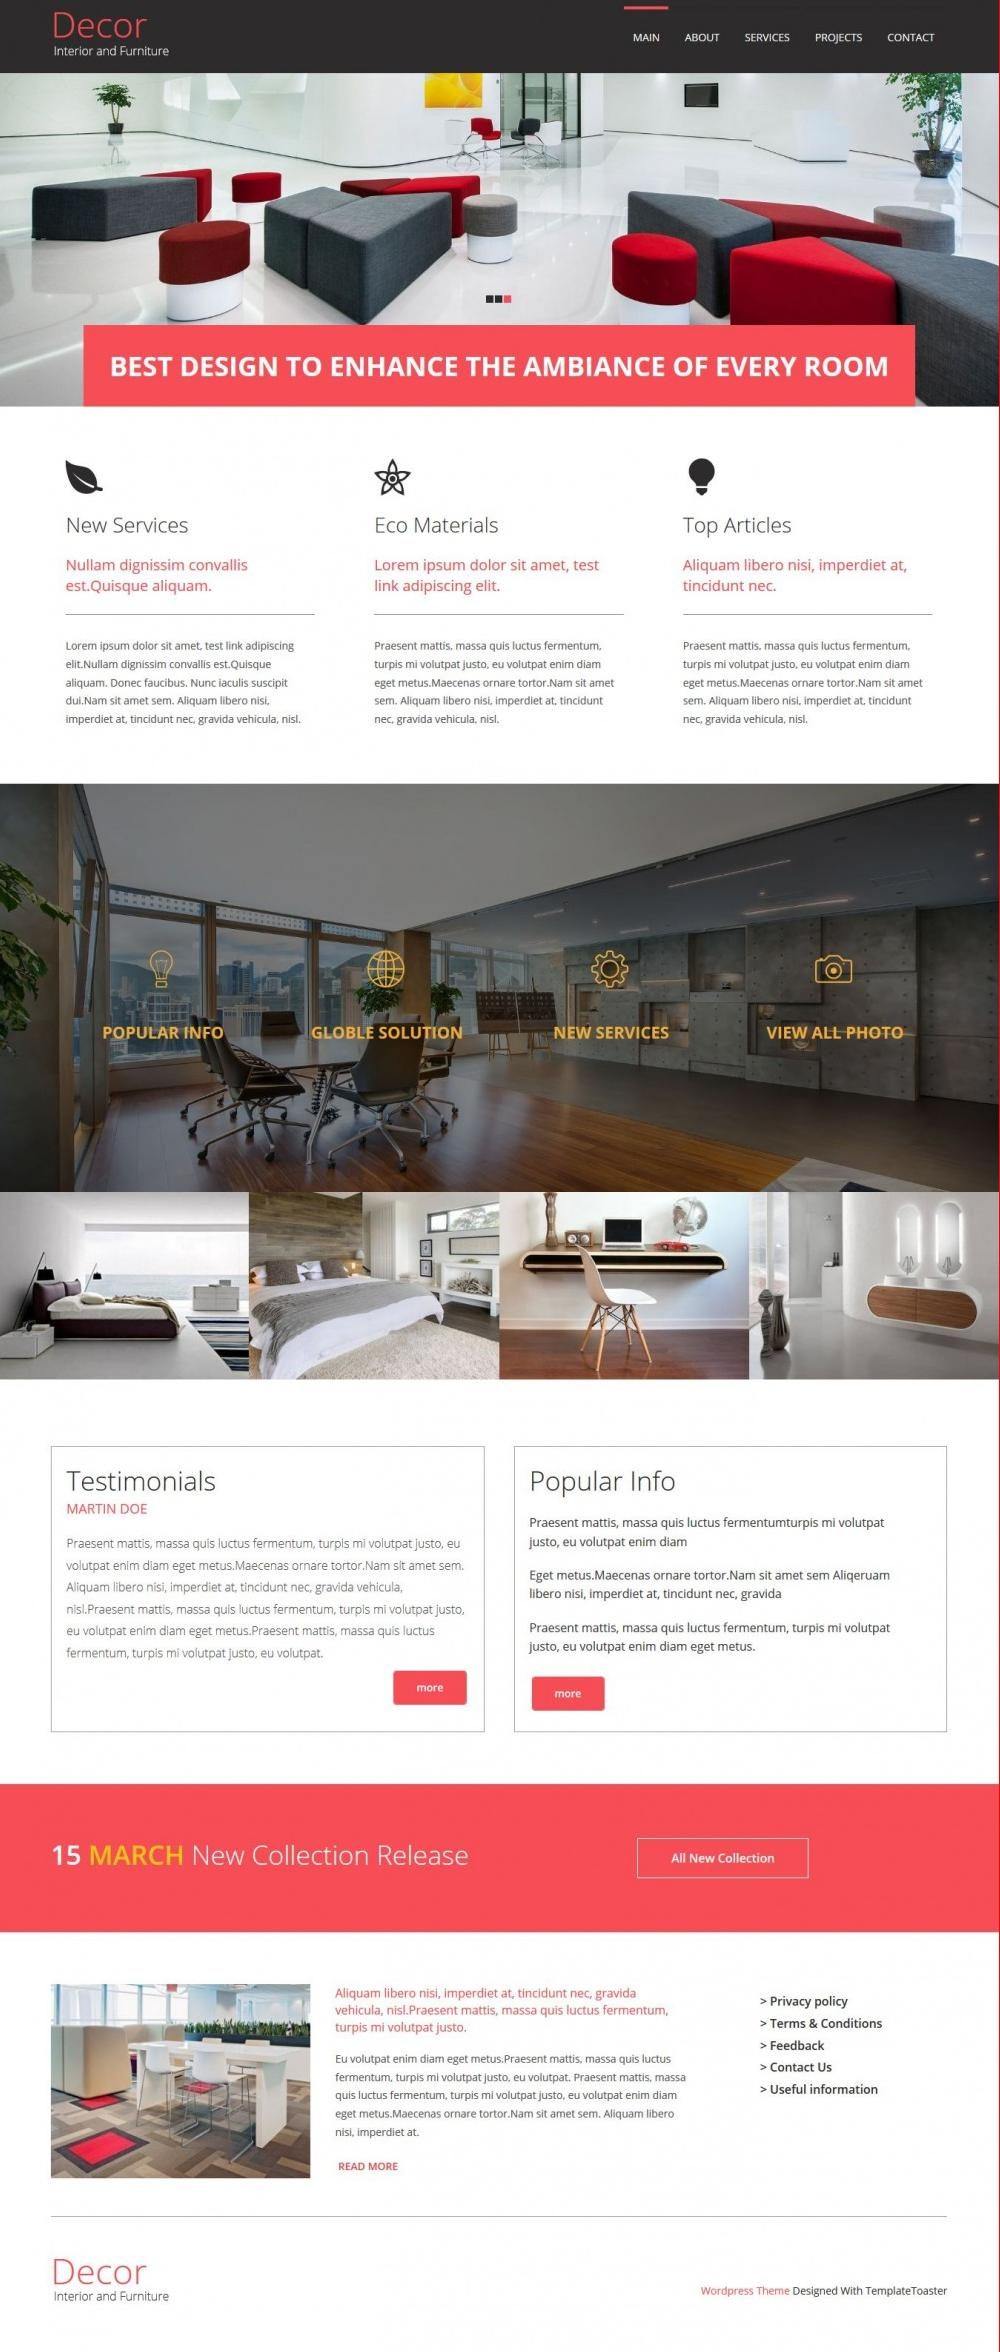 Decore - Interior and Furniture WordPress Theme